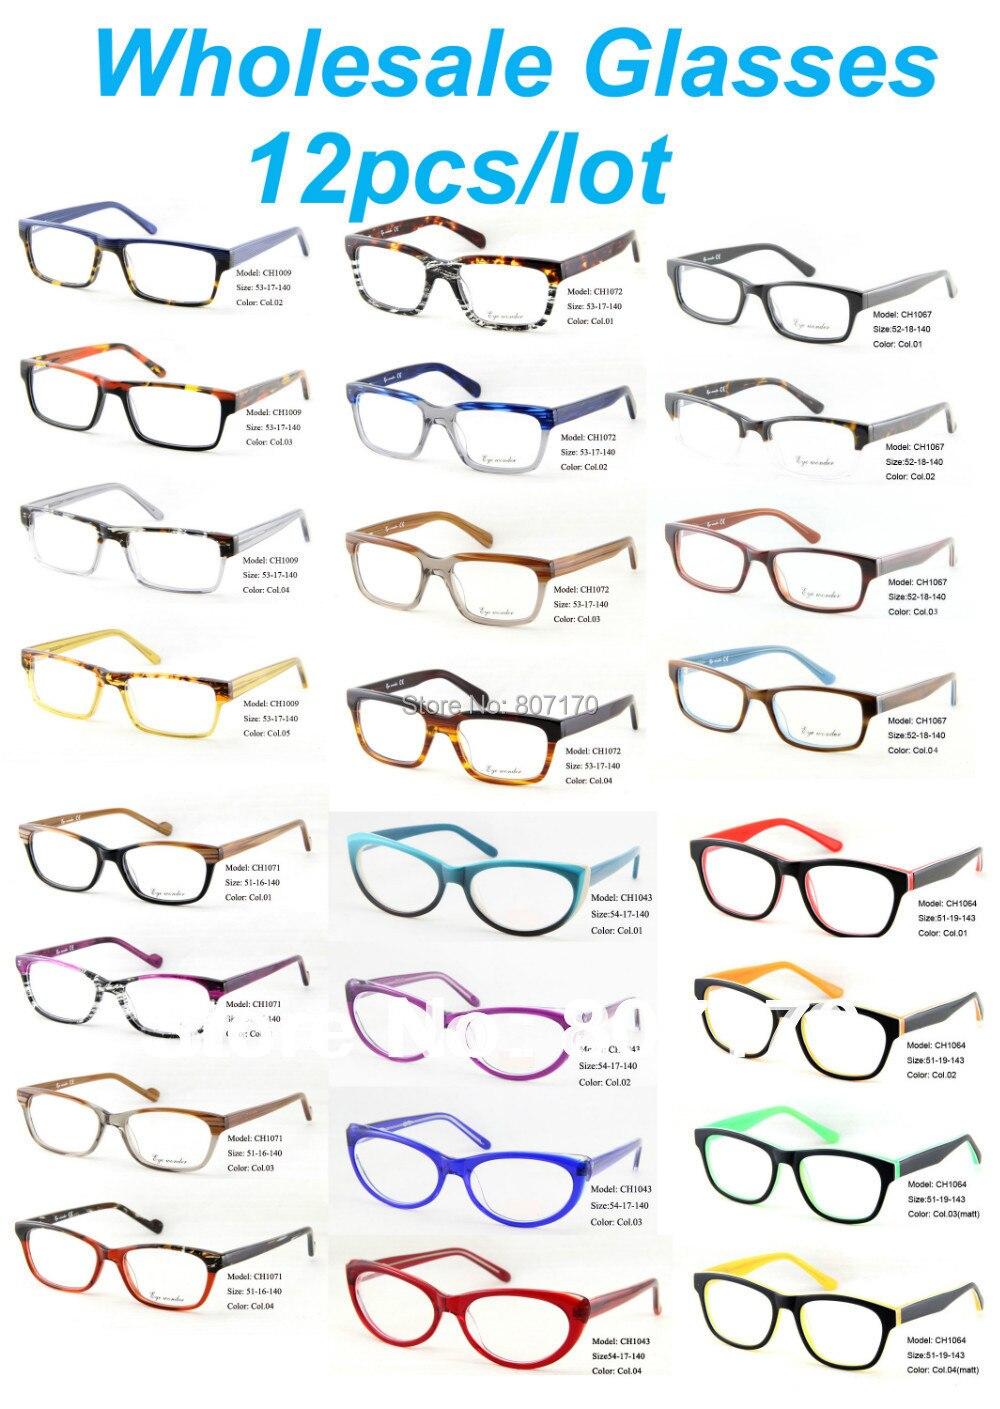 Eyeglasses brands list